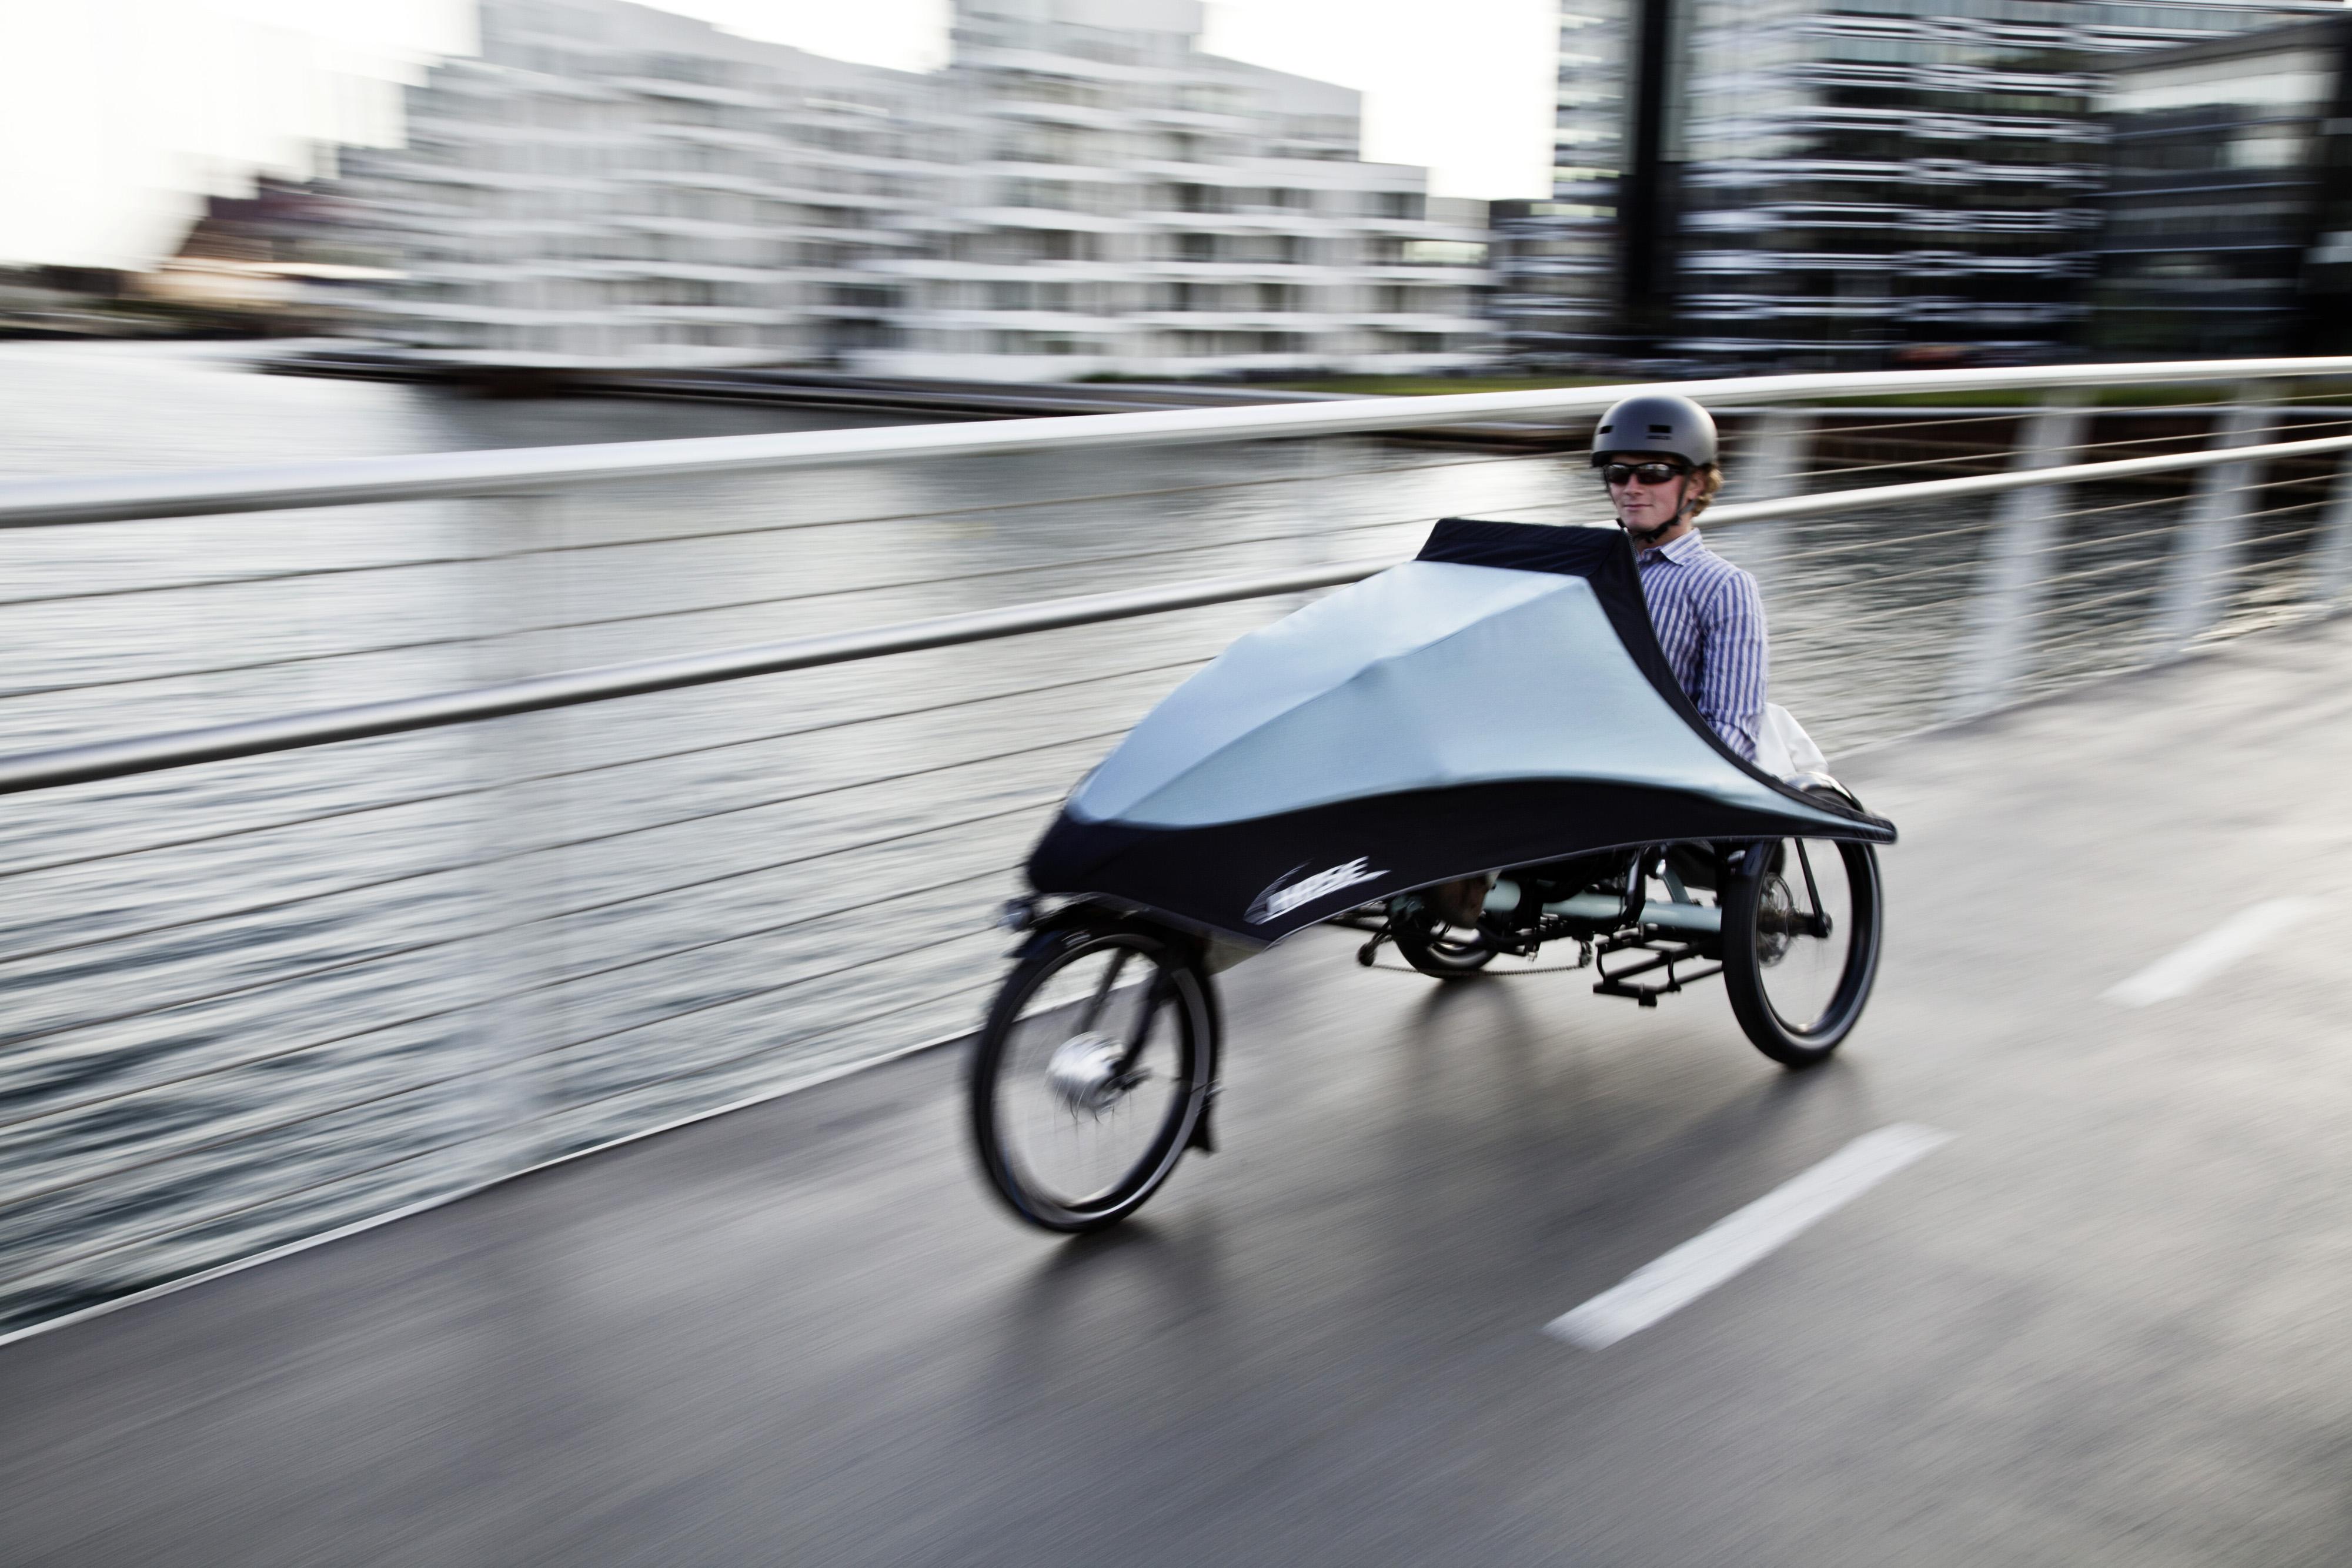 The velomobile: high-tech bike or low-tech car? - LOW-TECH